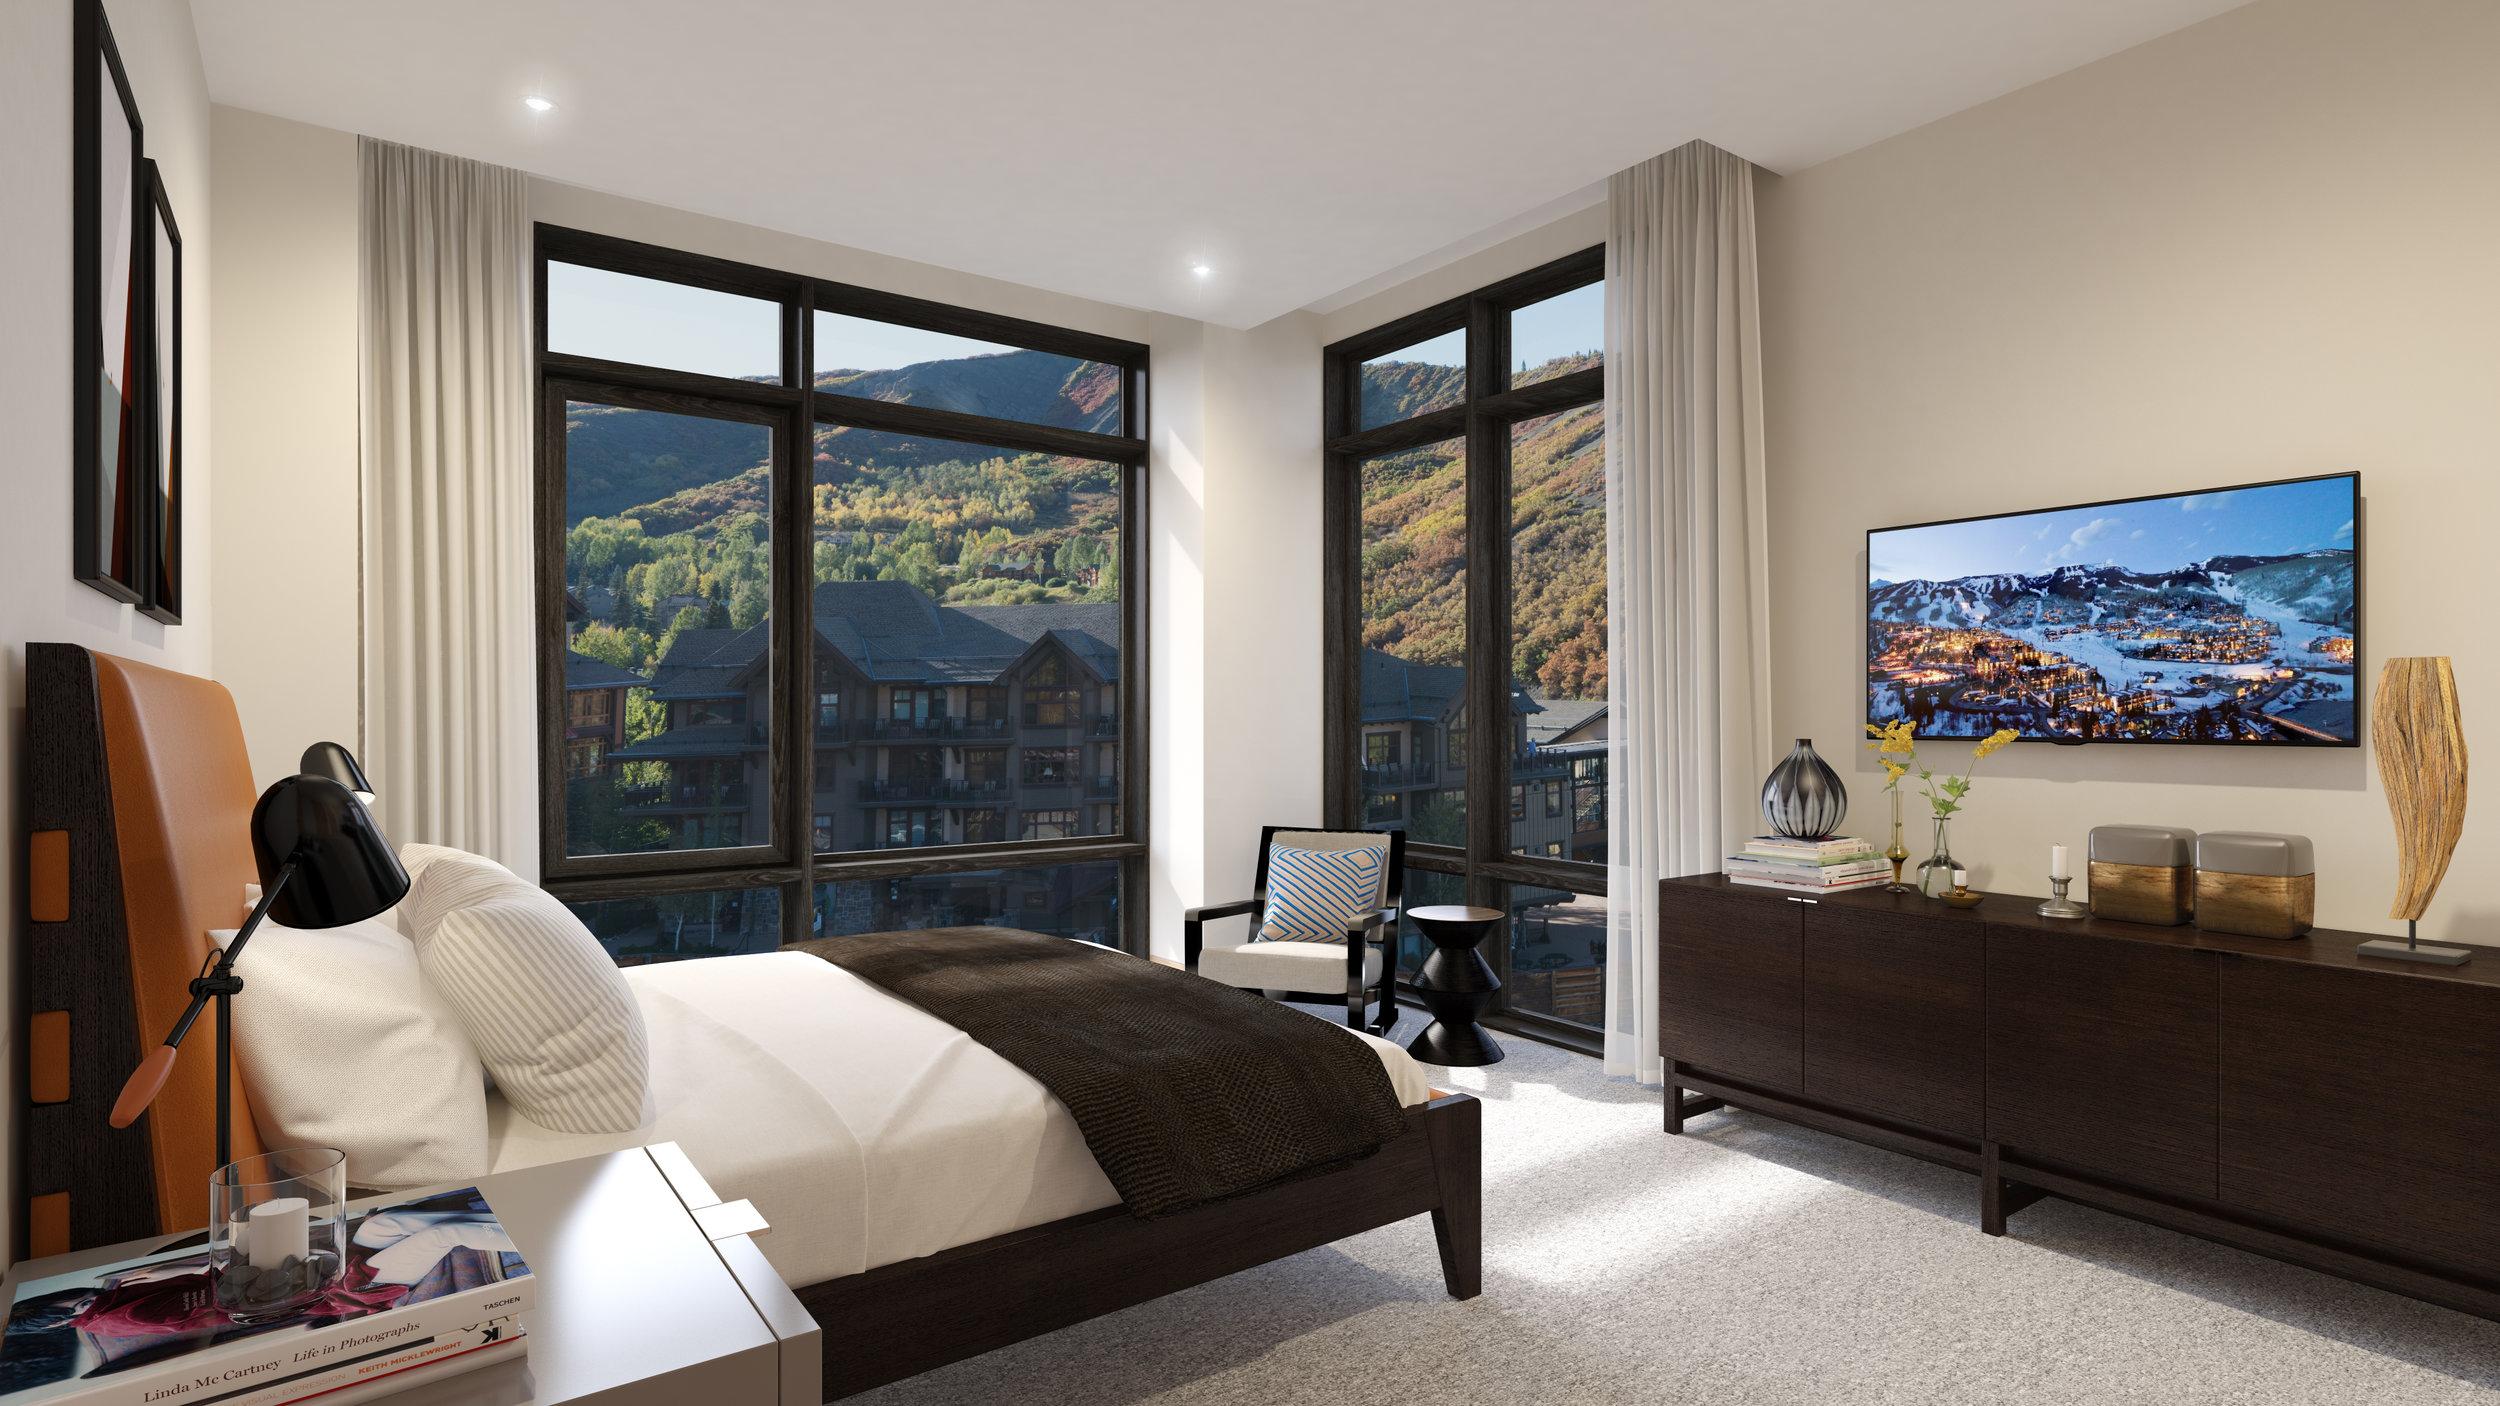 OS 502 Scheme 2 Bedroom - Final.jpg